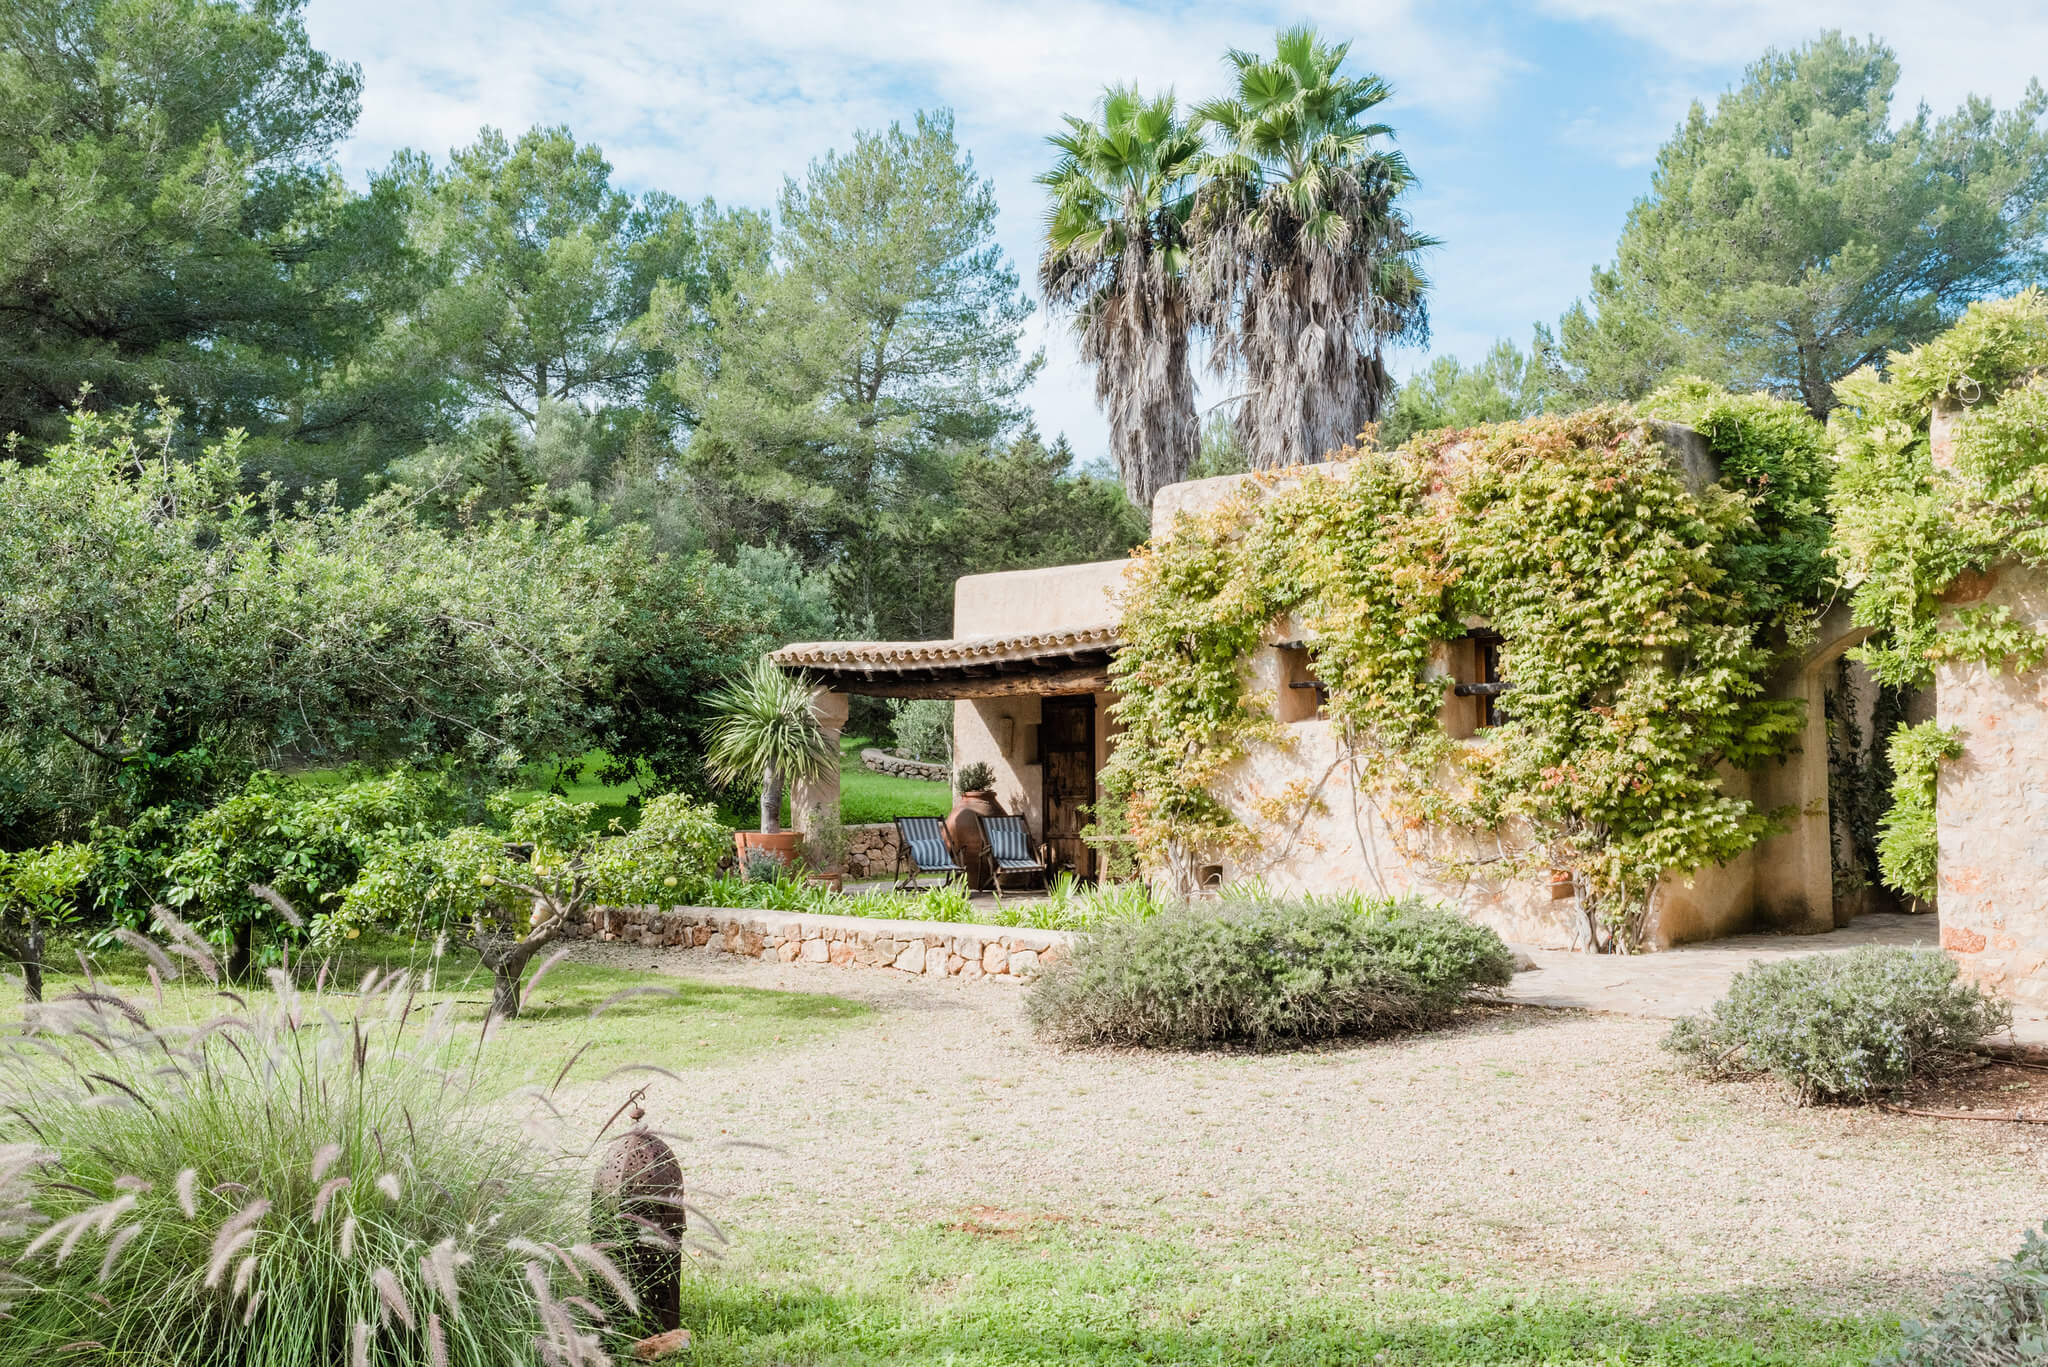 https://www.white-ibiza.com/wp-content/uploads/2020/05/white-ibiza-villas-can-sabina-exterior-building.jpg